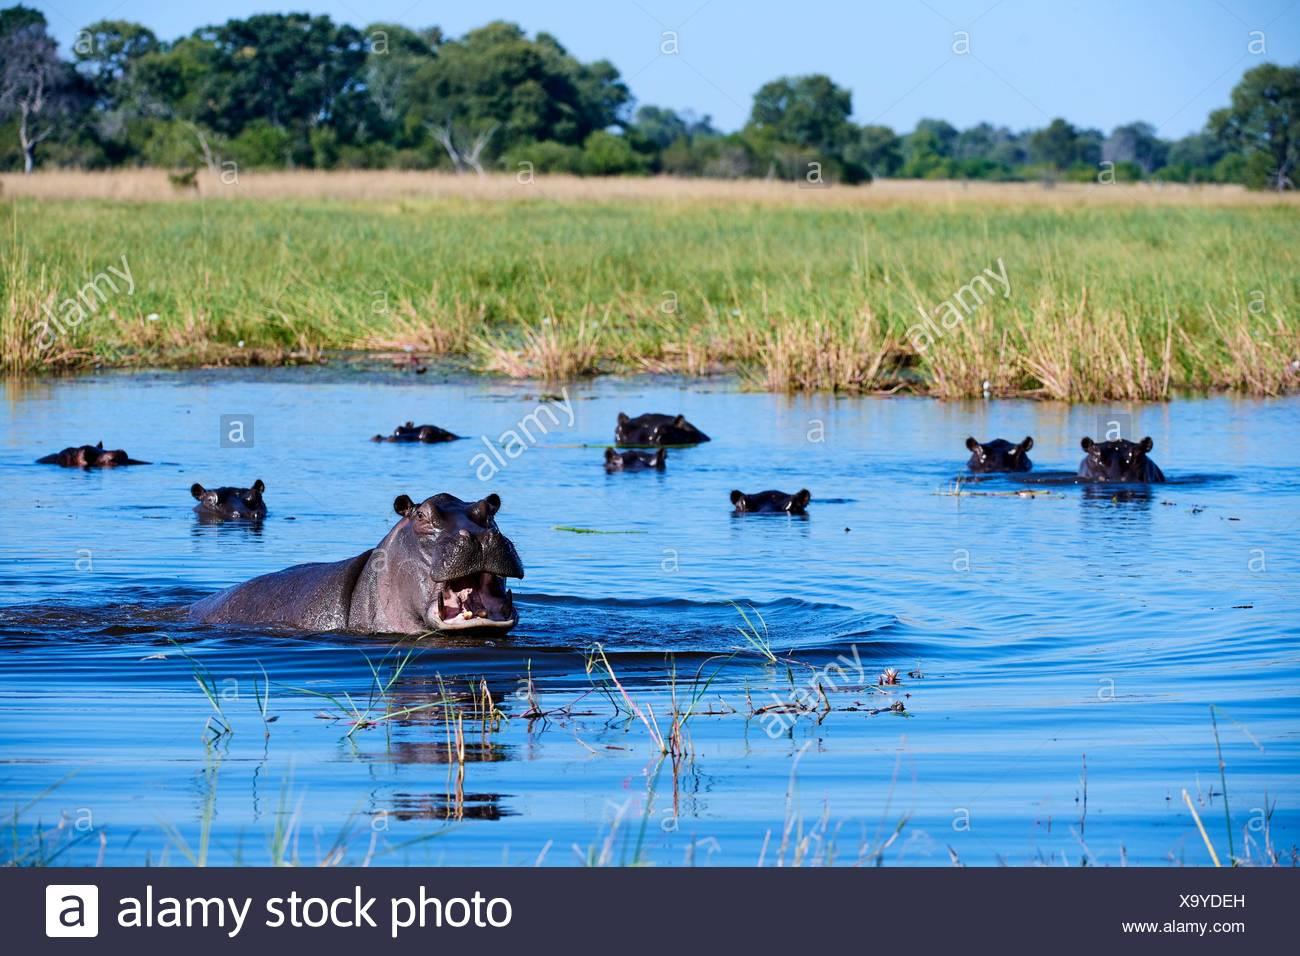 Hippopotamus (Hippopotamus amphibius) showing territorial agression. Moremi National Park, Okavango delta, Botswana, Southern Africa. - Stock Image